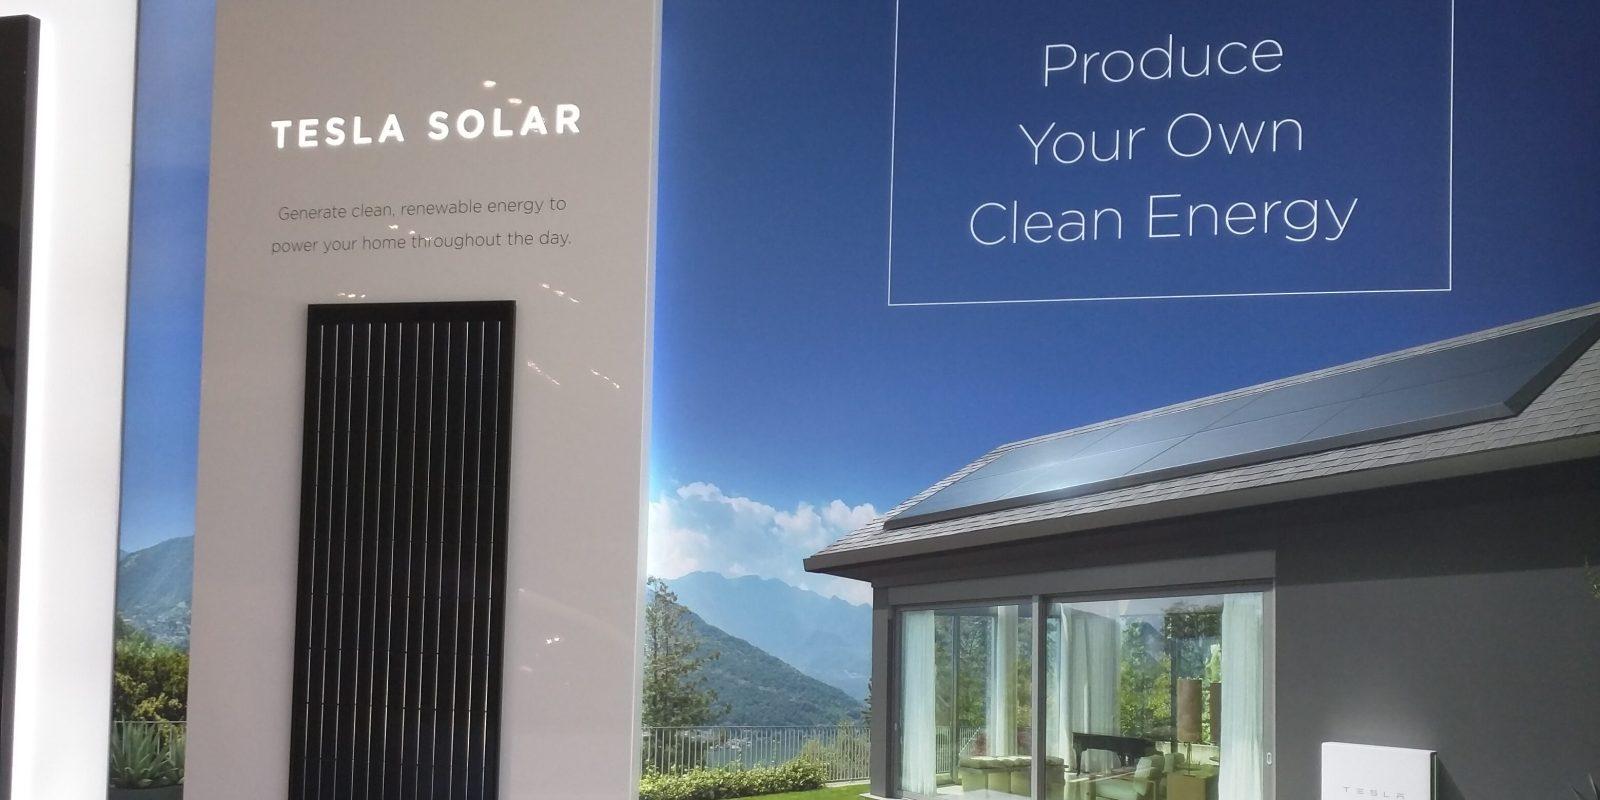 Tesla Starts Displaying New Tesla Solar Branded Solar